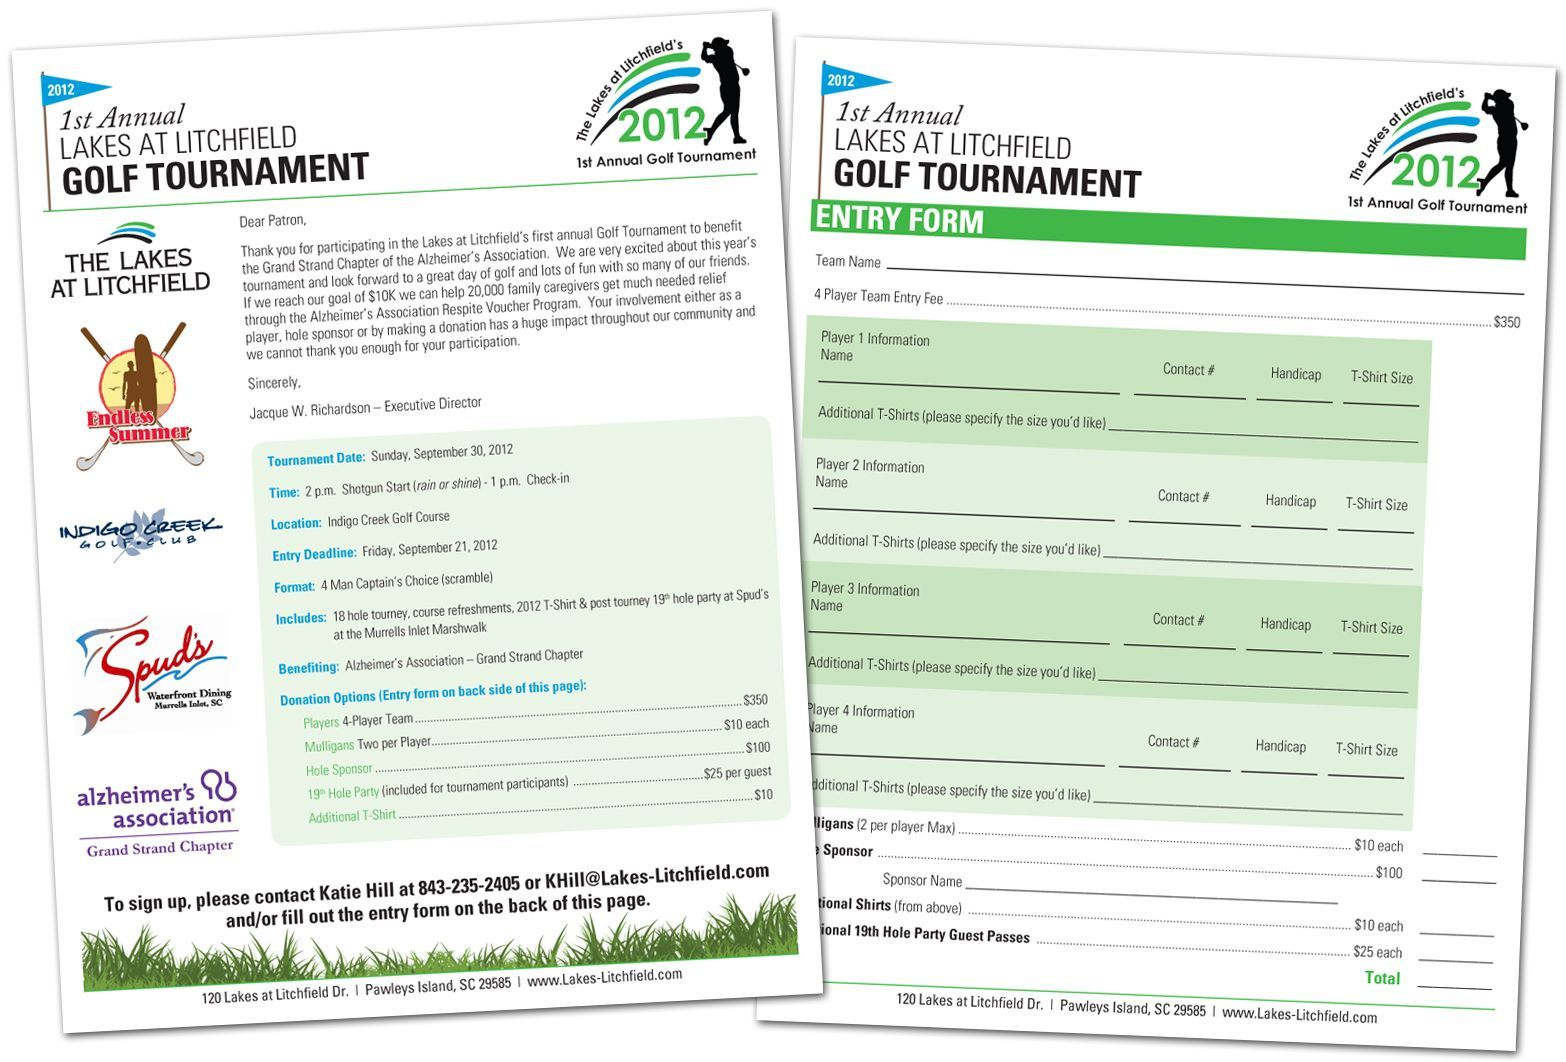 Ad5b35d2fb753f5d5acabdcfab3172bc Jpg 1566 1062 Golf Tournament Golf Websites Tournaments Concession stand sign up sheet